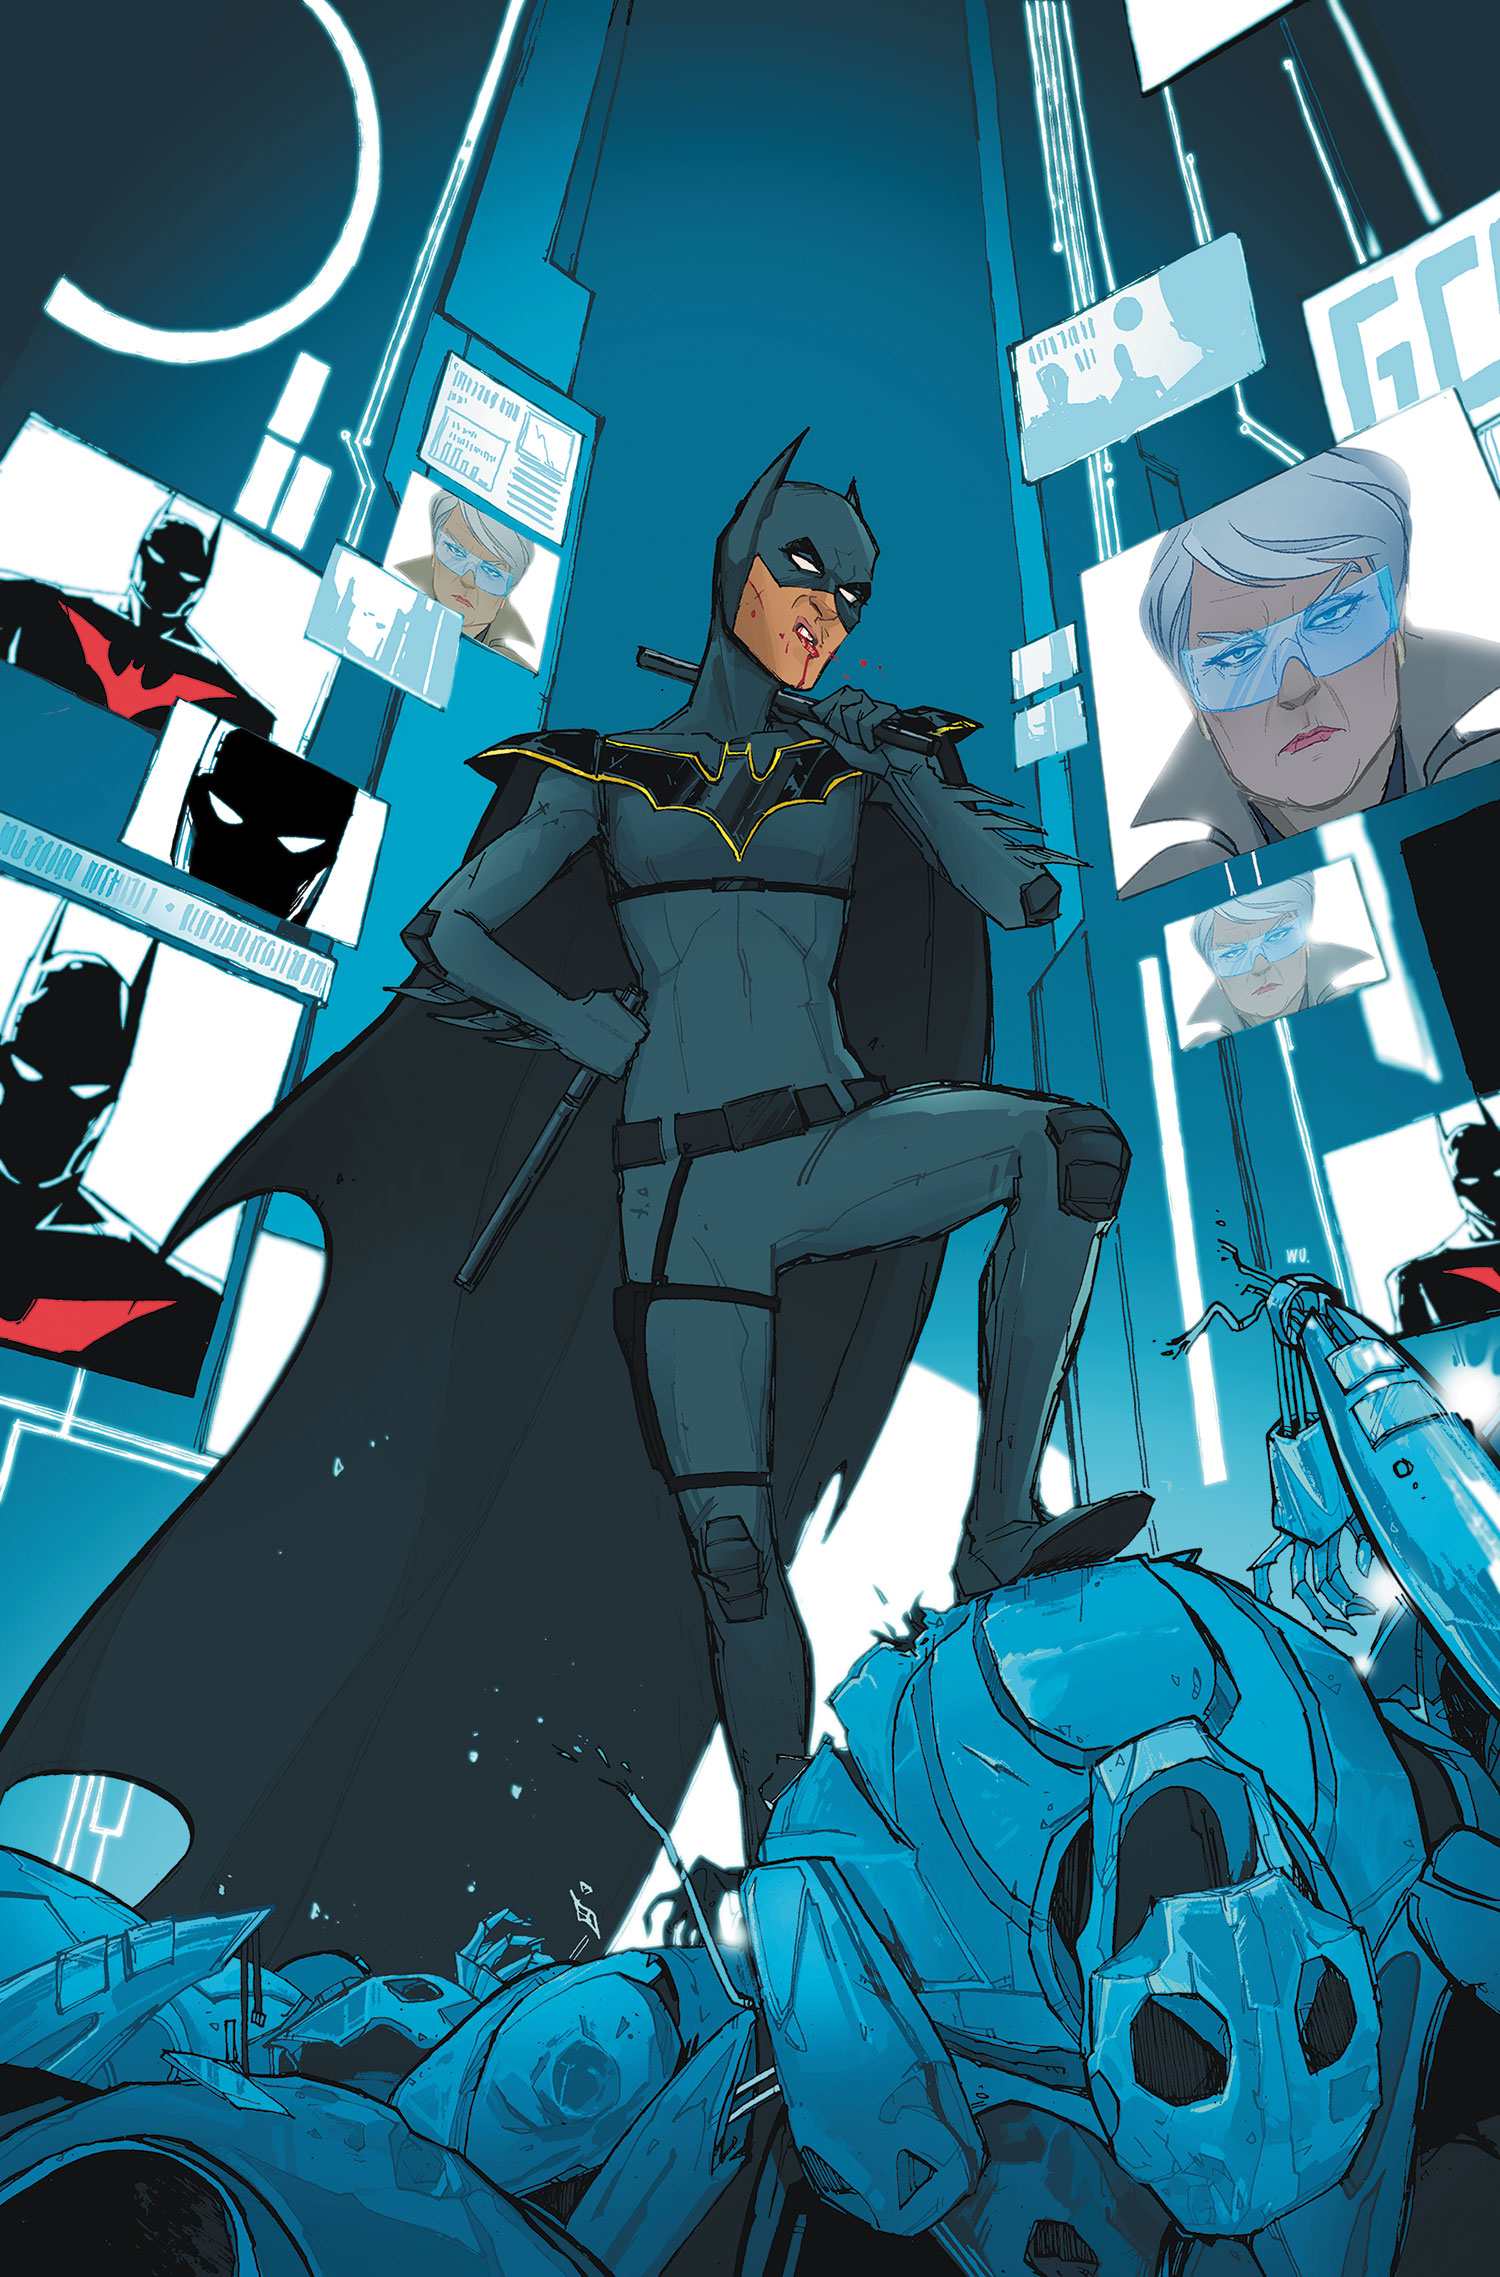 Batman Beyond Unlimited Vol 1 18 - DC Comics DatabaseNew 52 Batman Beyond